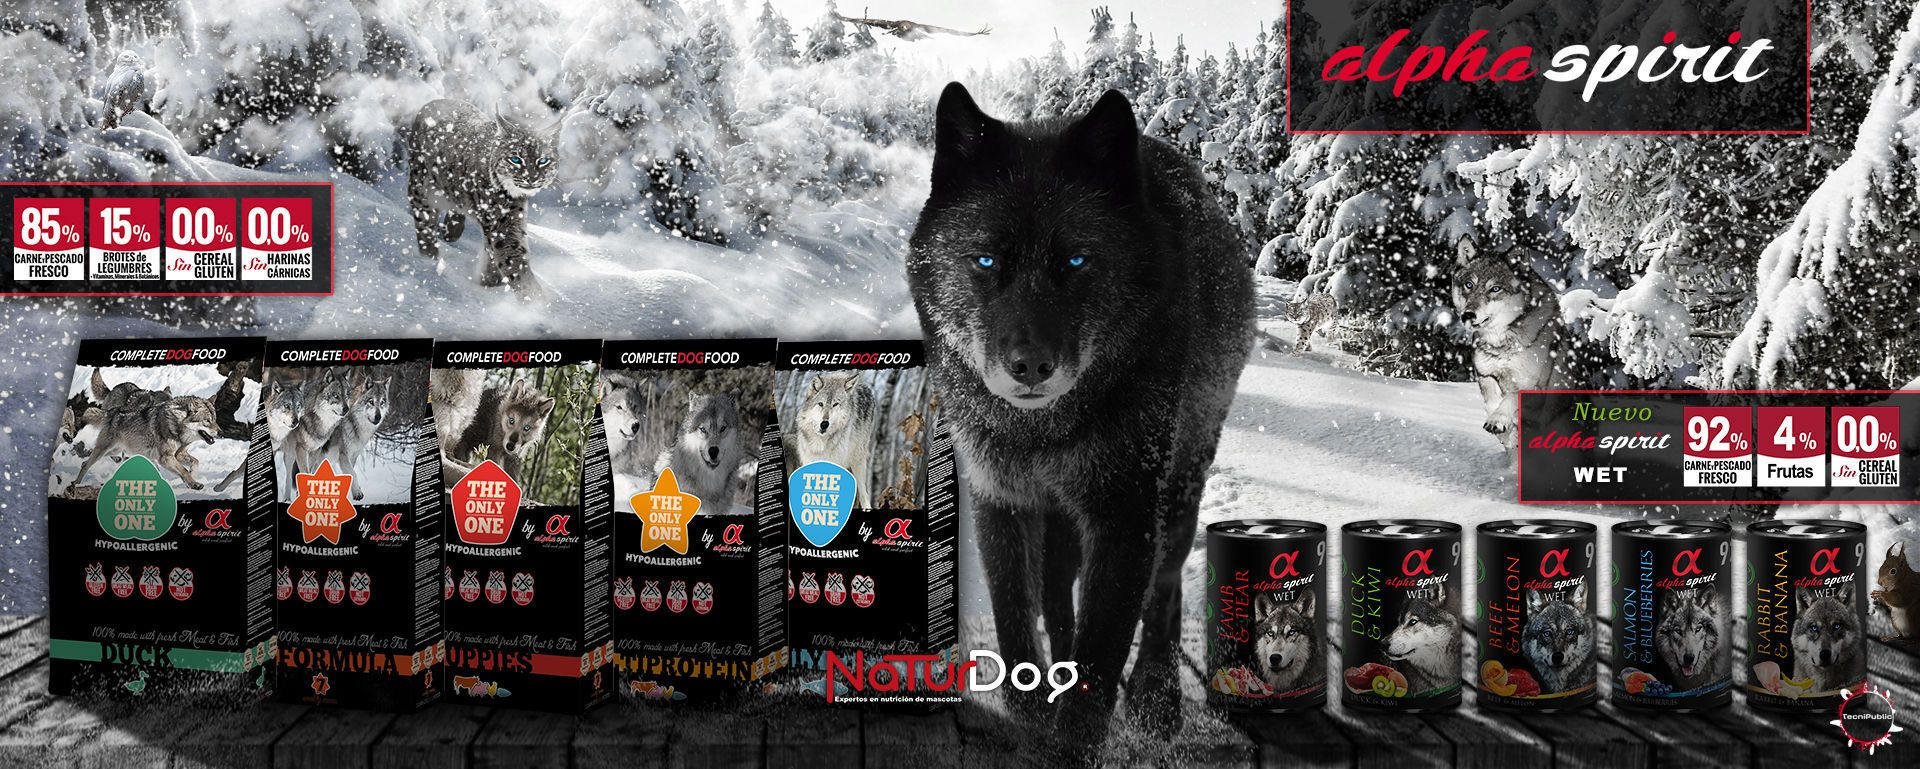 Alpha-Spirit-alimentacion-humeda-seca-sticks-snacks-2-NaturDog-designed-by-TecniPublic.es.jpg?1.1.1